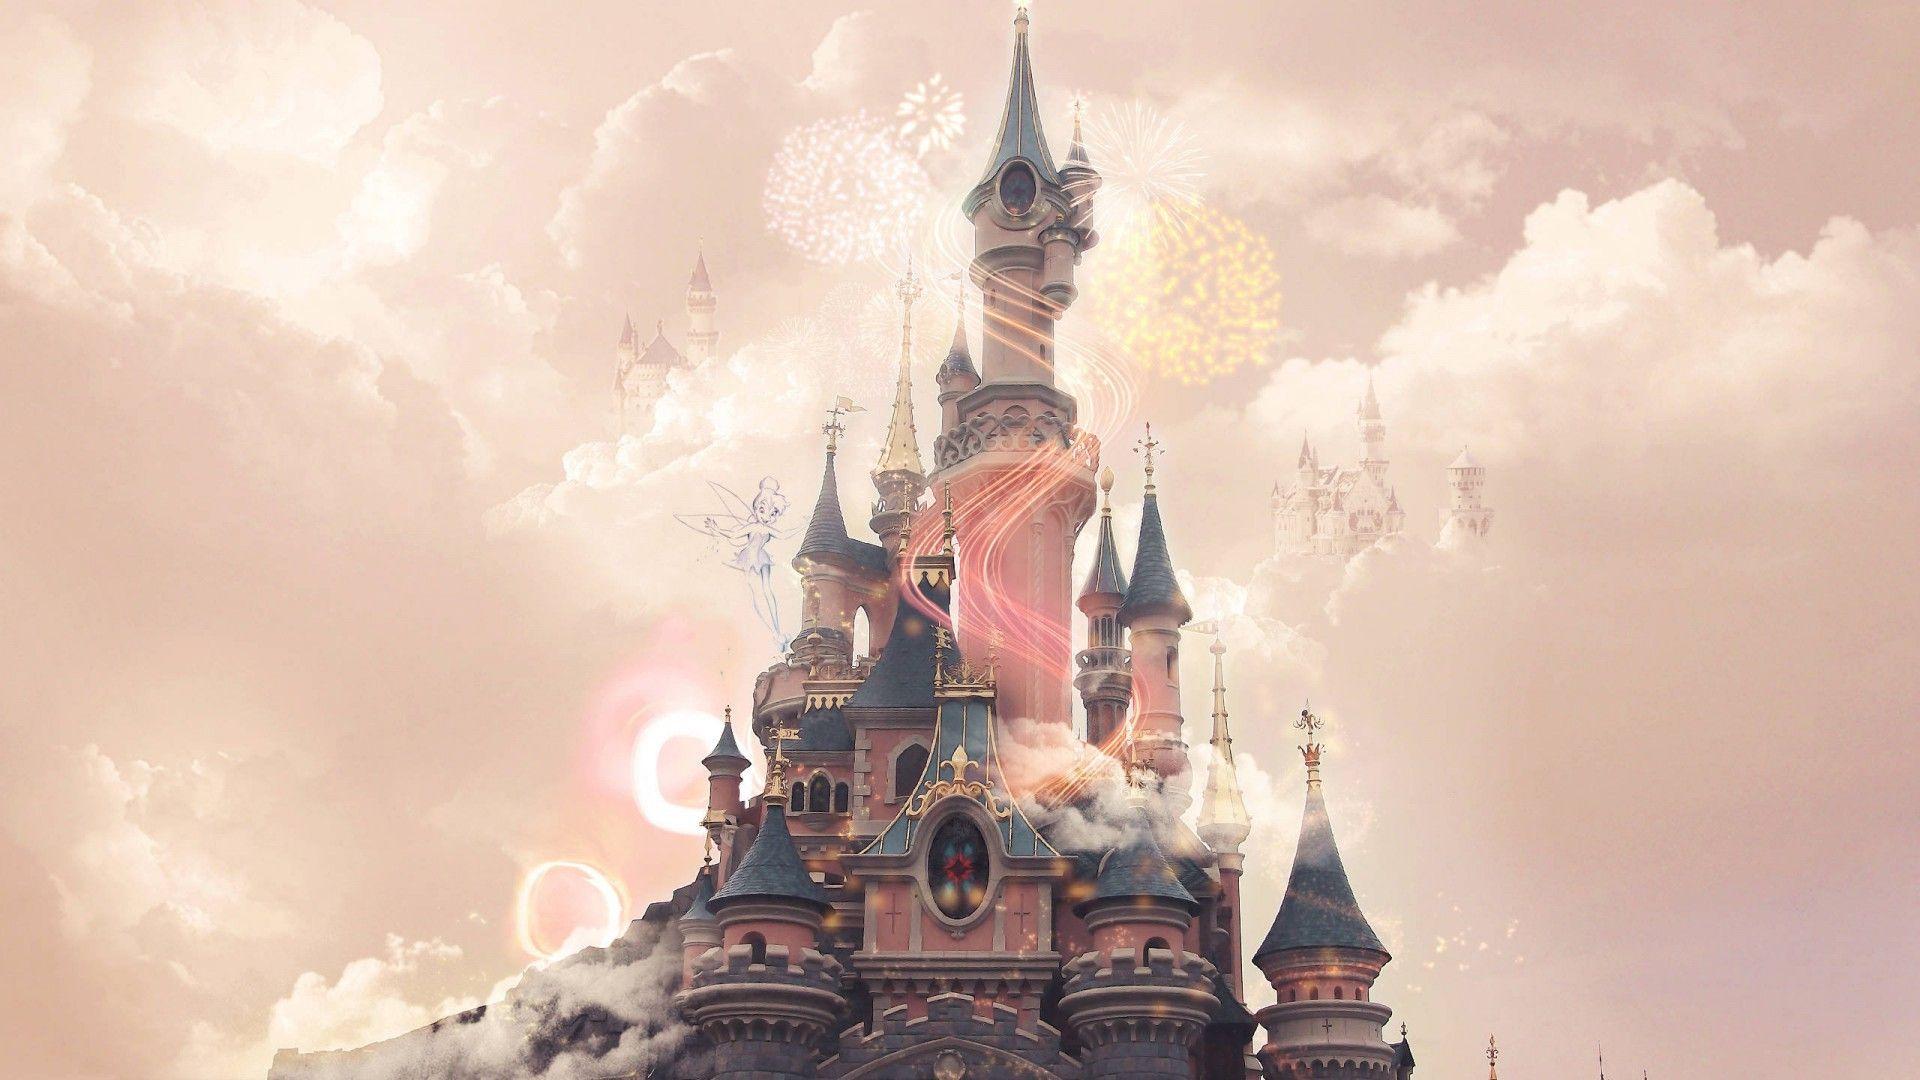 Castillo De La Cenicienta Papel Tapiz Disney Fondos De Pantalla Escritorio Fondos Tumblr